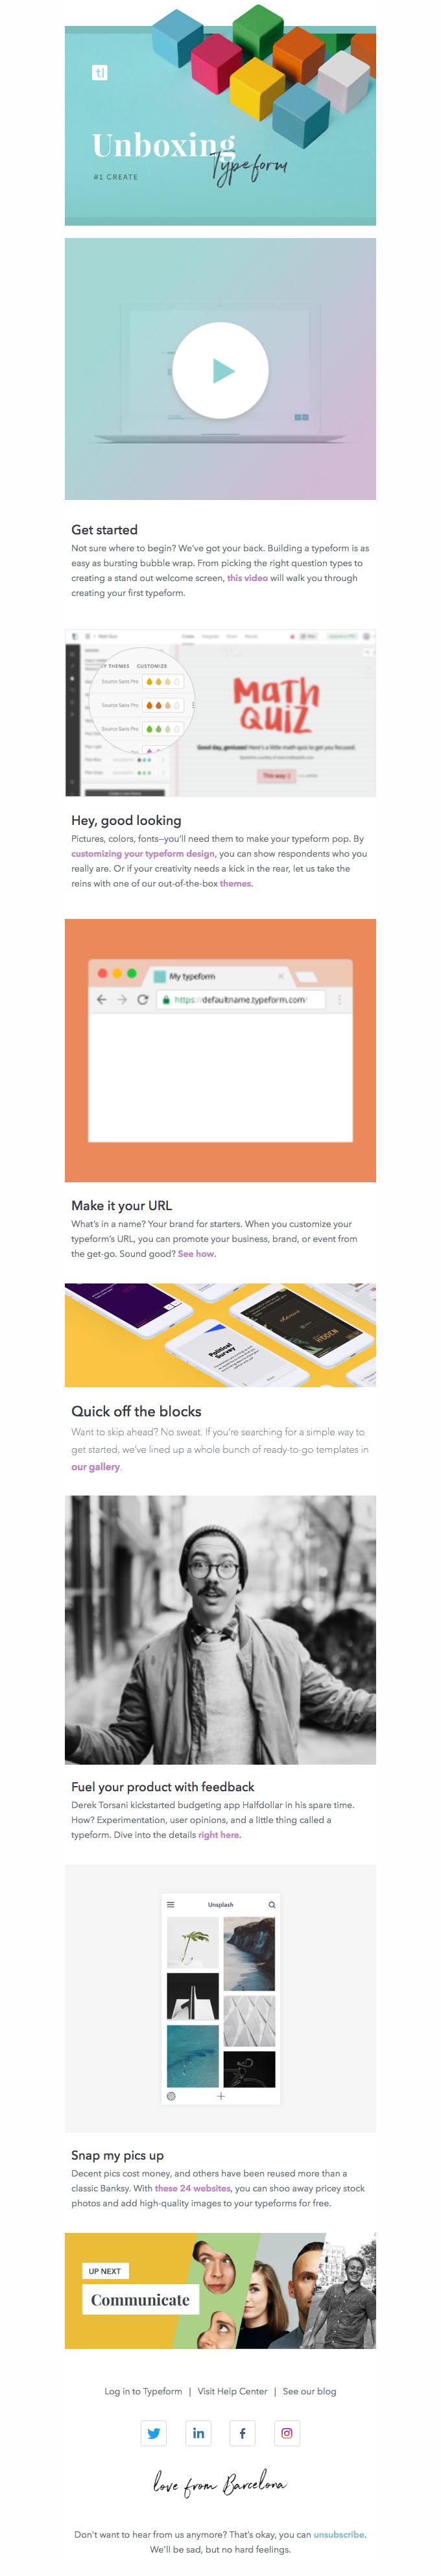 Unboxing Typeform: Create (1 of 4)